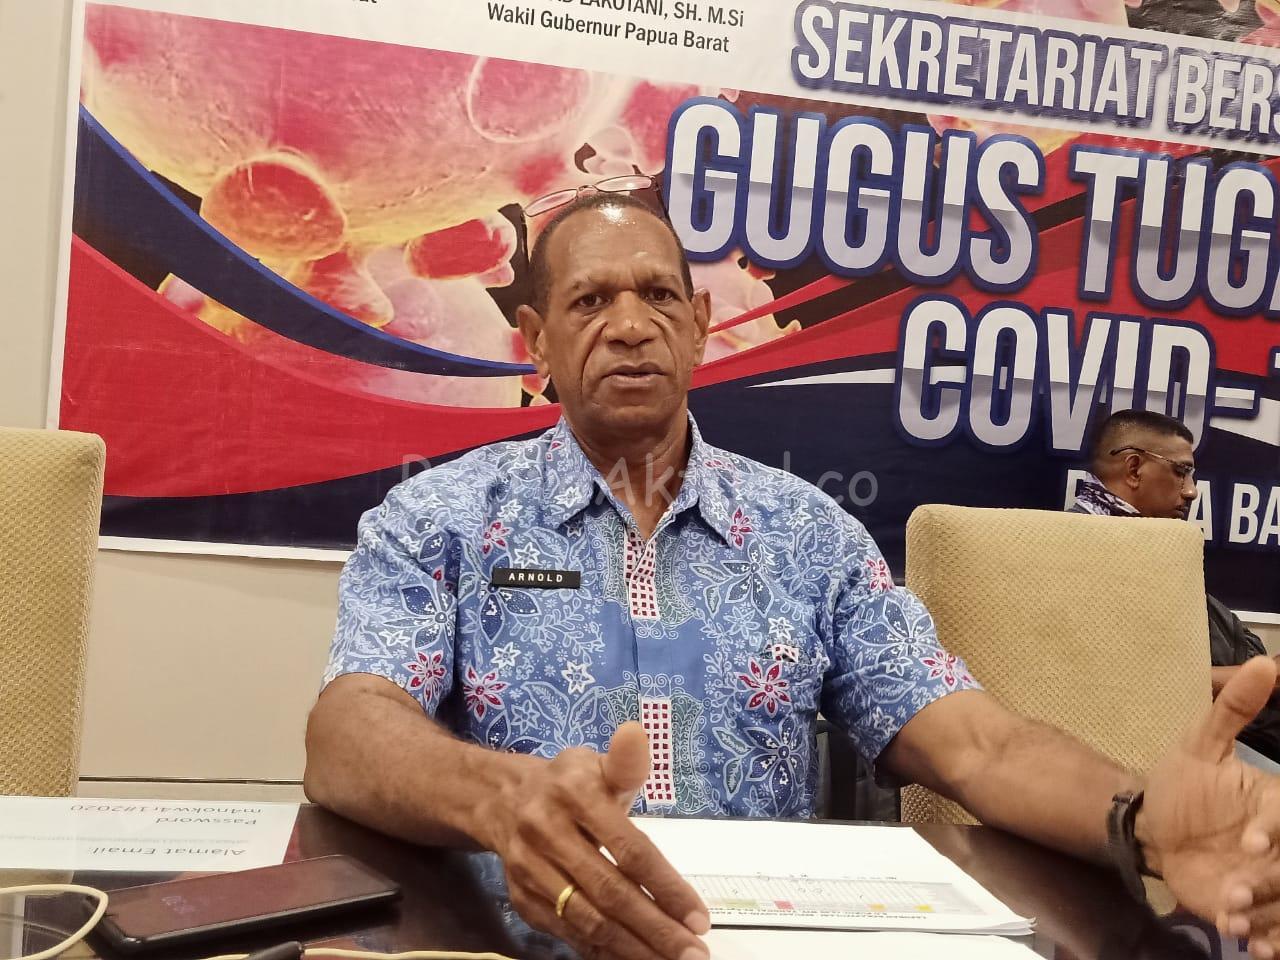 Pasien Positif Corona di Papua Barat Hari Ini 28 April Naik Dua Kali Lipat 1 IMG 20200427 WA0032